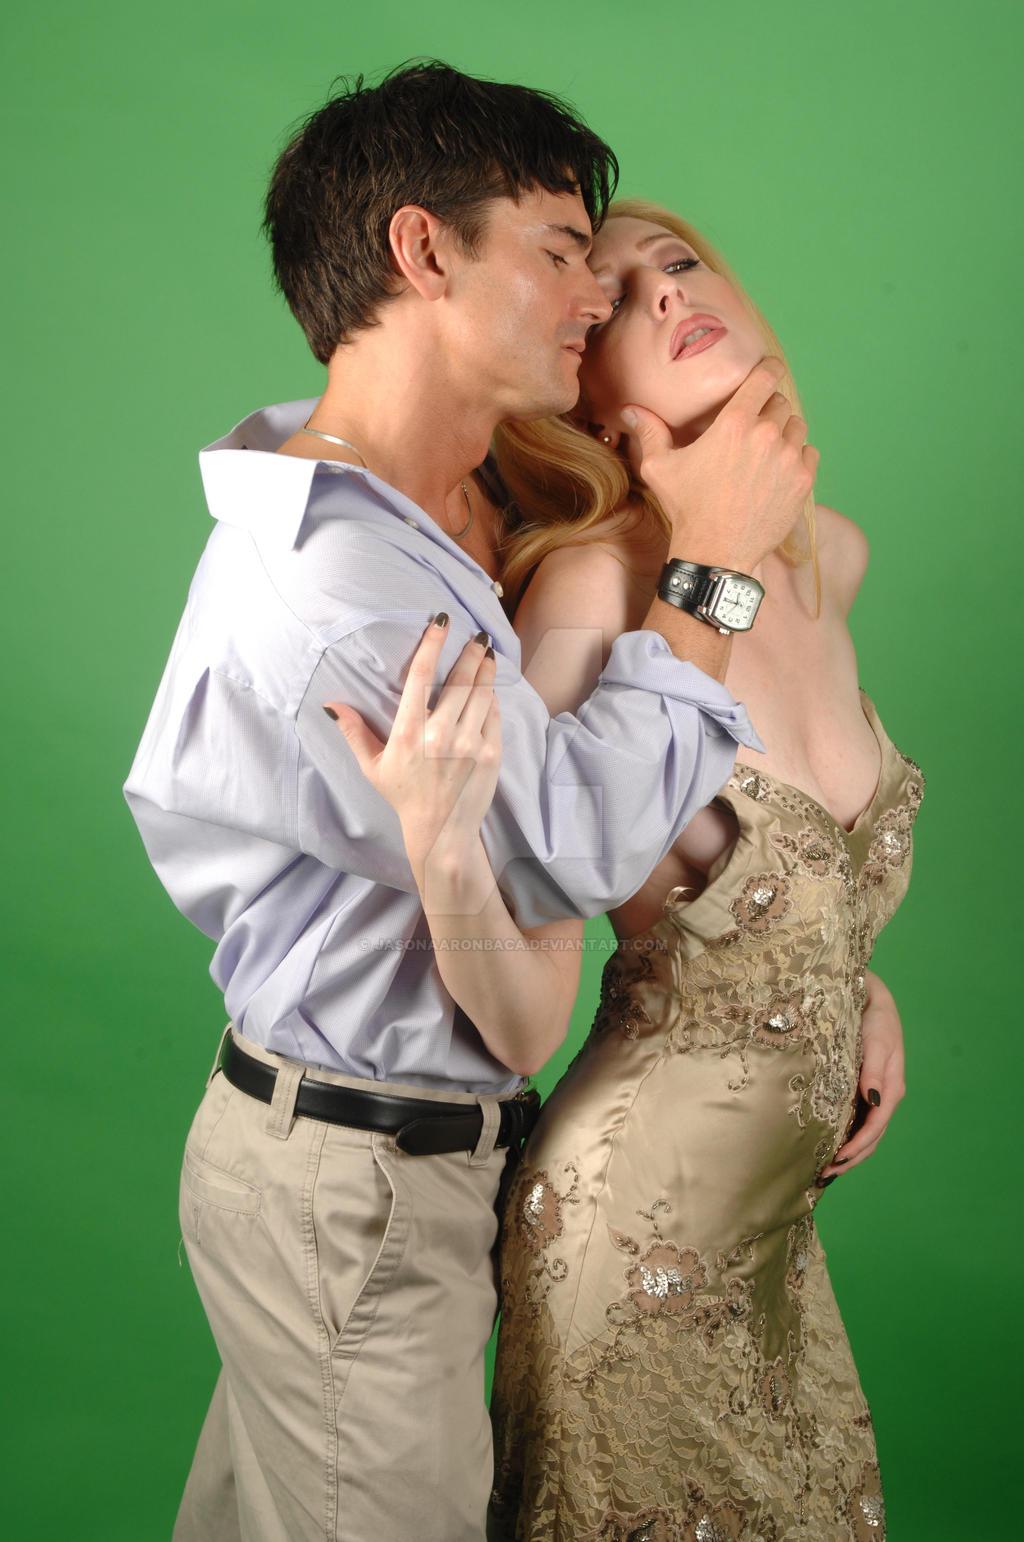 romance cover model by jasonaaronbaca